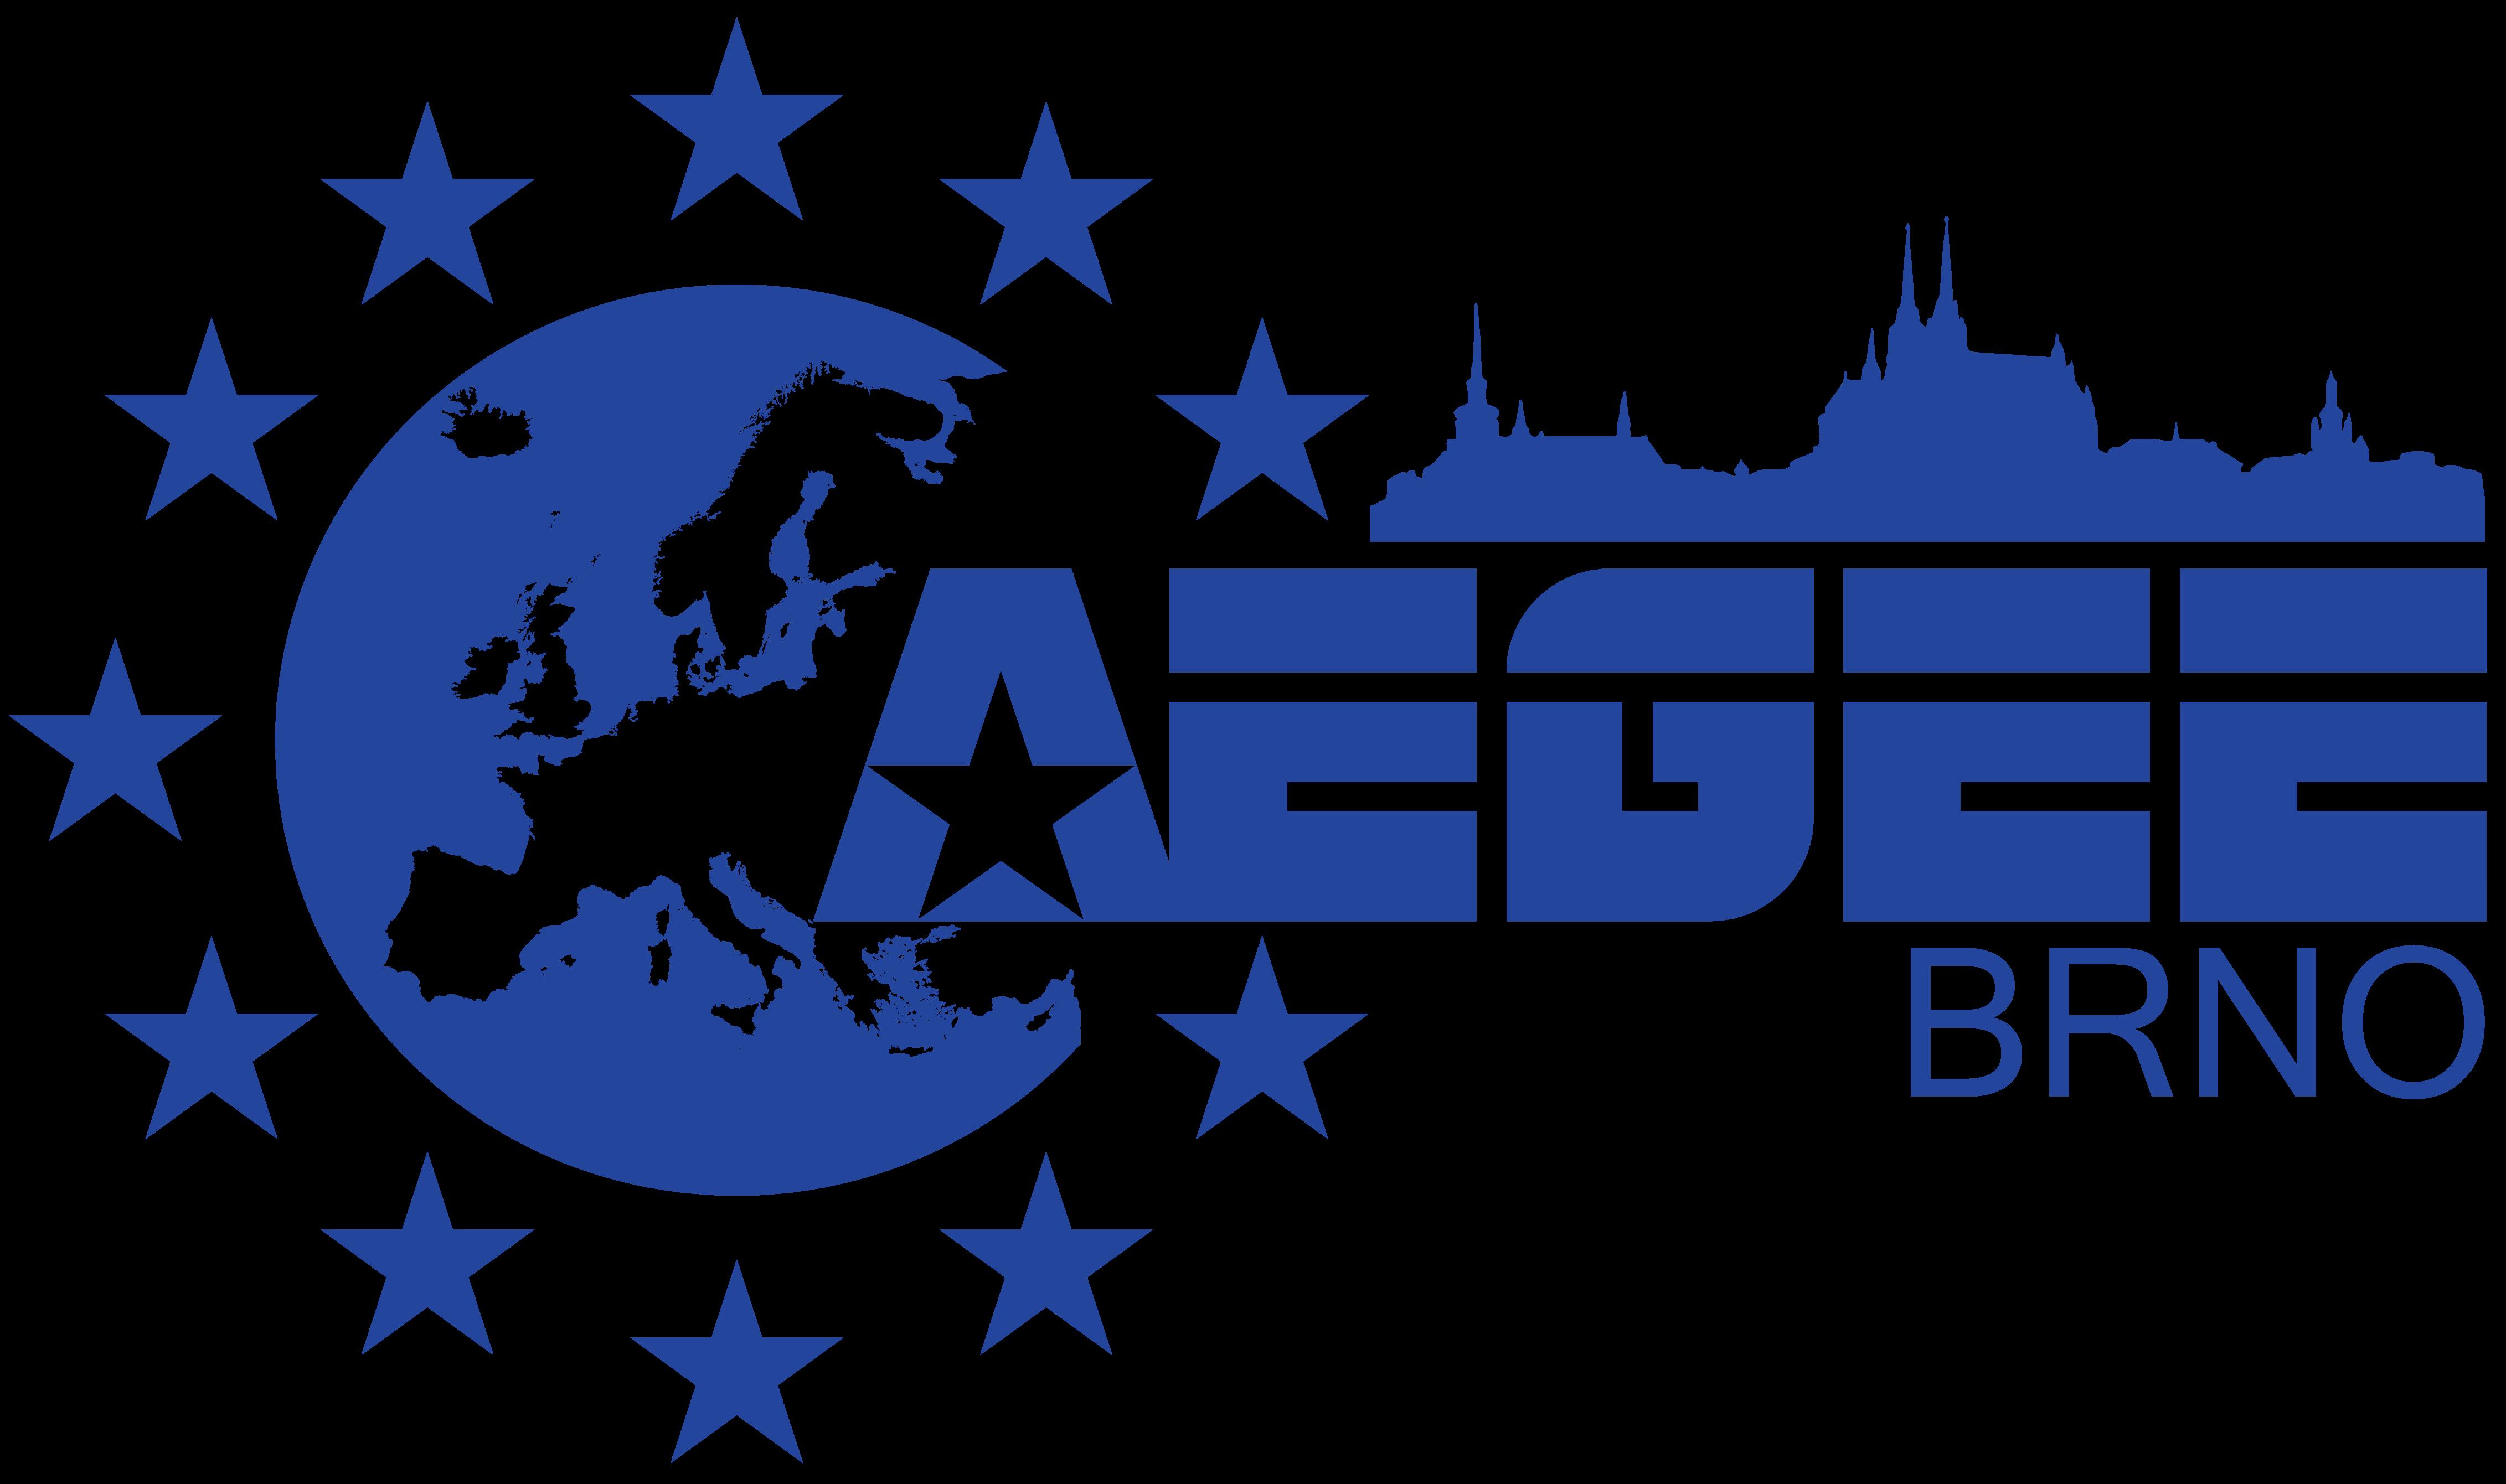 AeGeeBrnoLogoP2